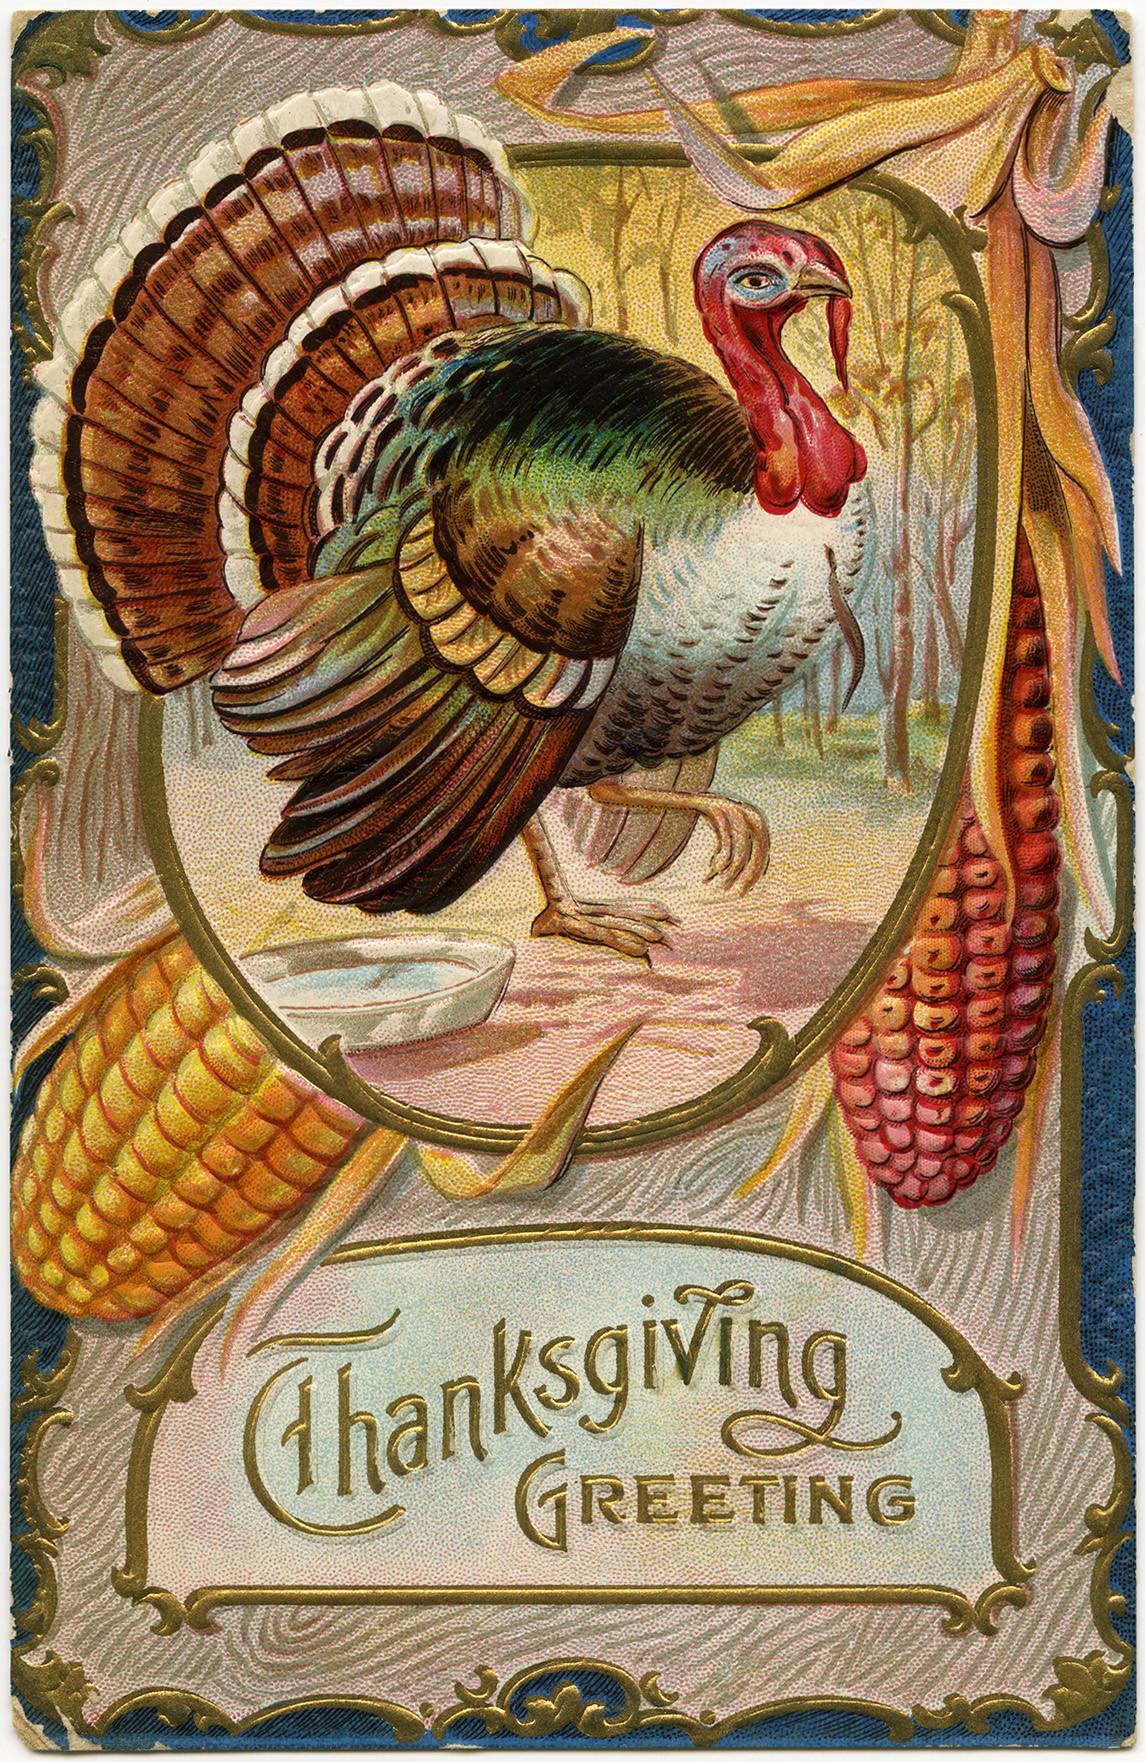 Turkey Pics Thanksgiving  Thanksgiving Greeting Turkey Postcard Old Design Shop Blog